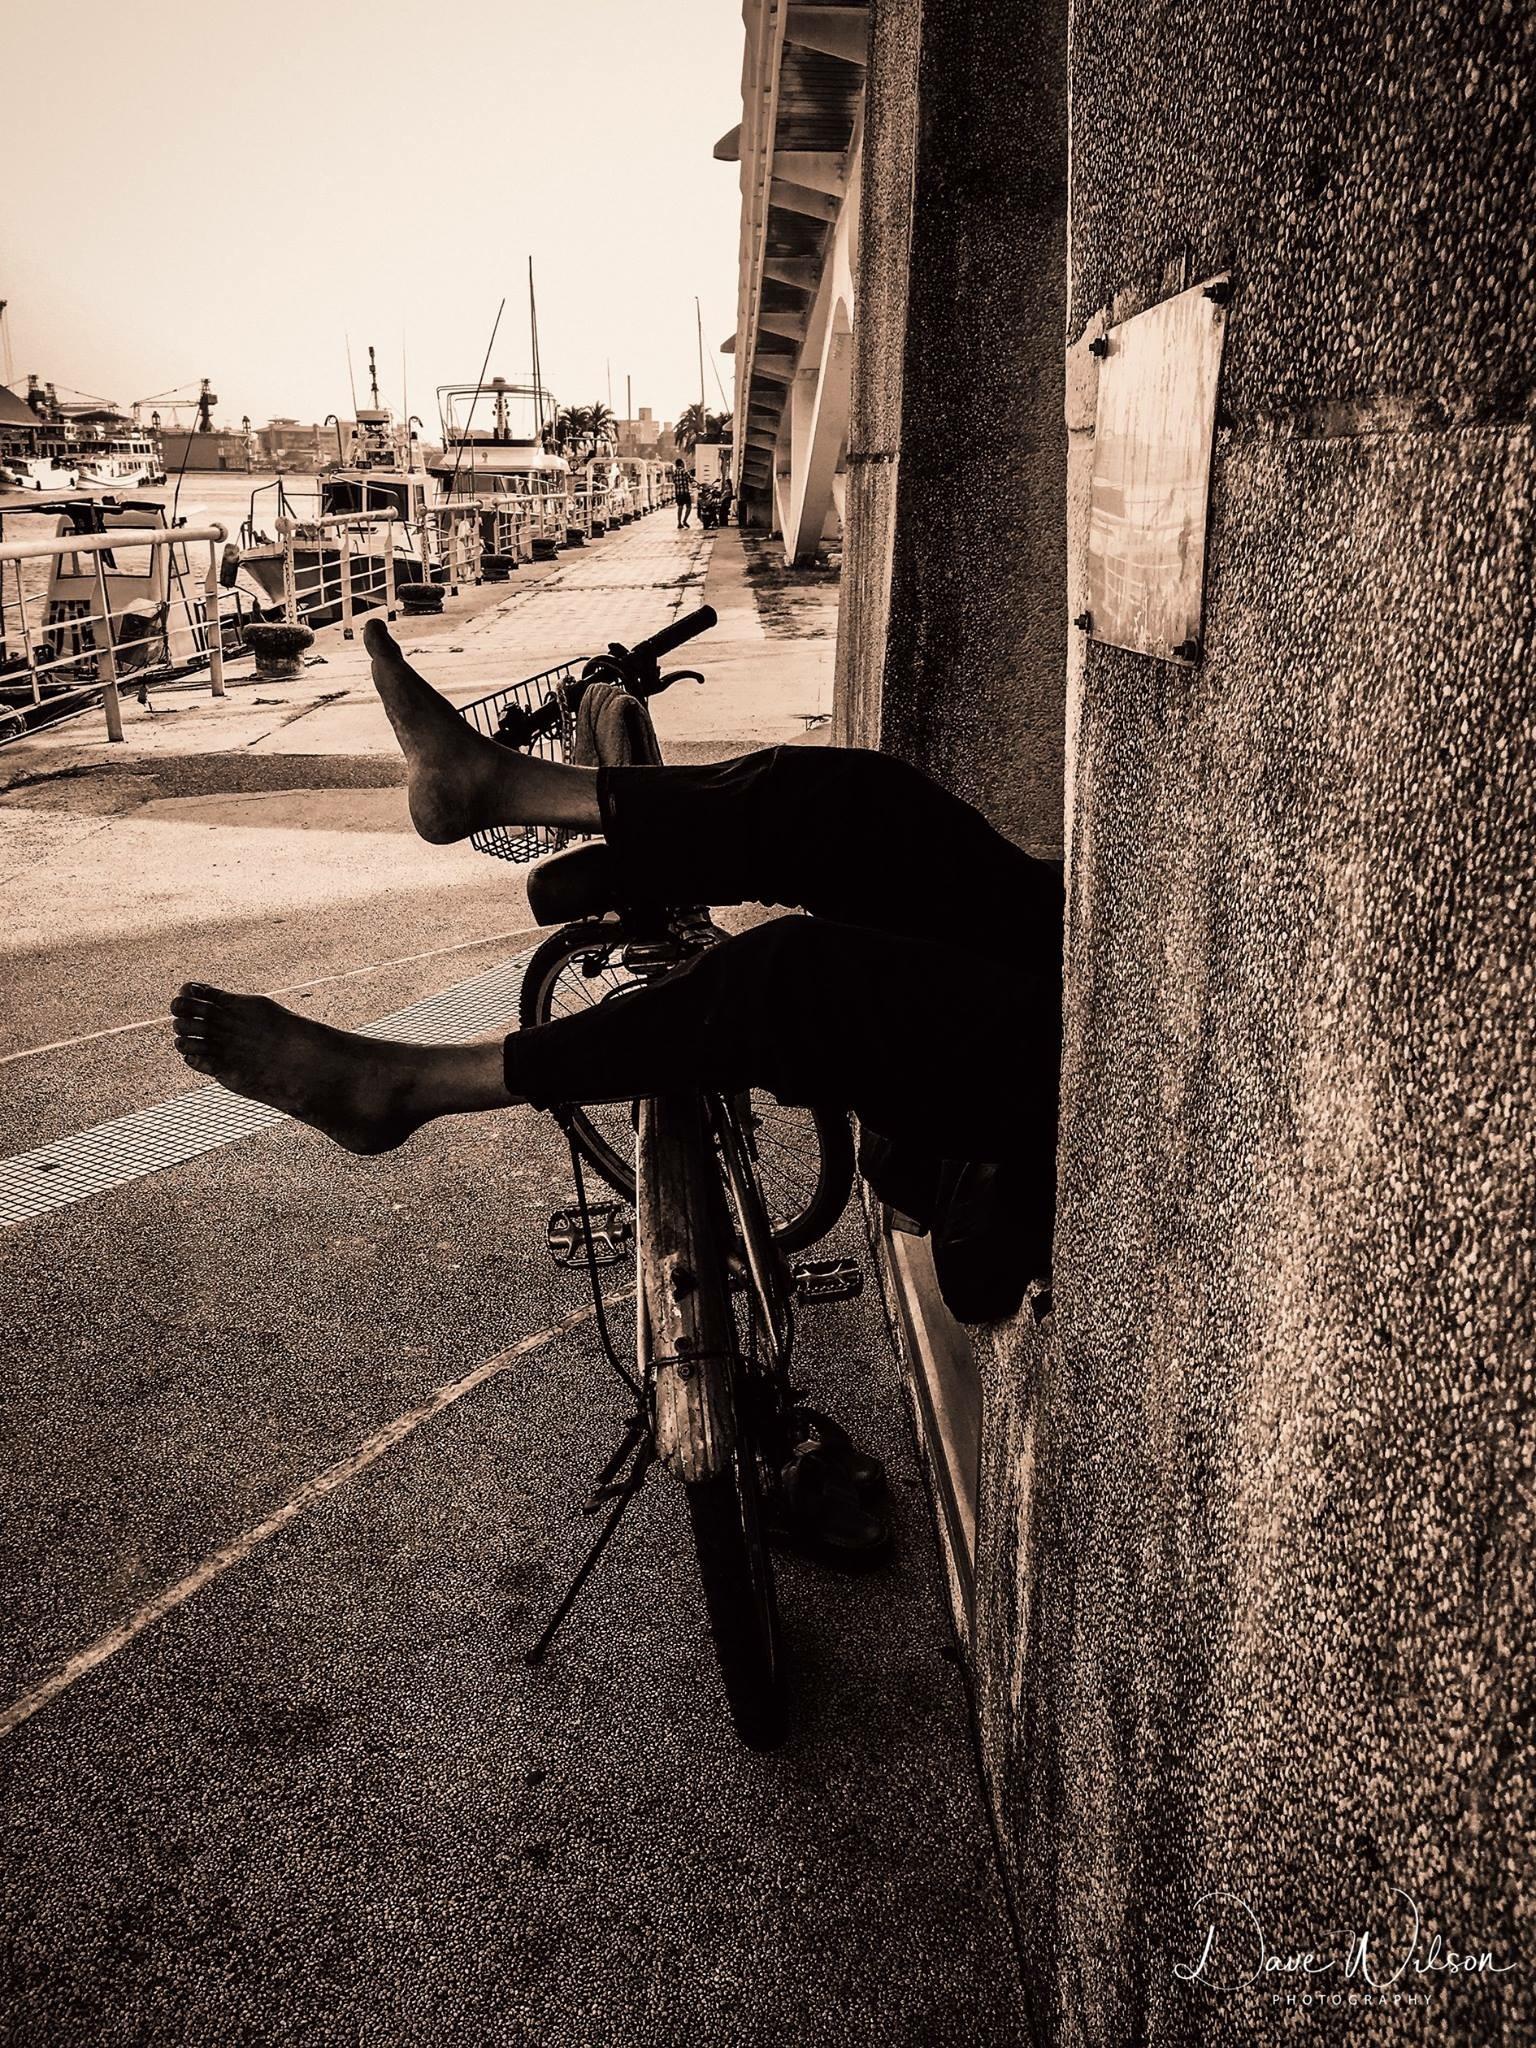 Homeless siesta by Dave Wilson